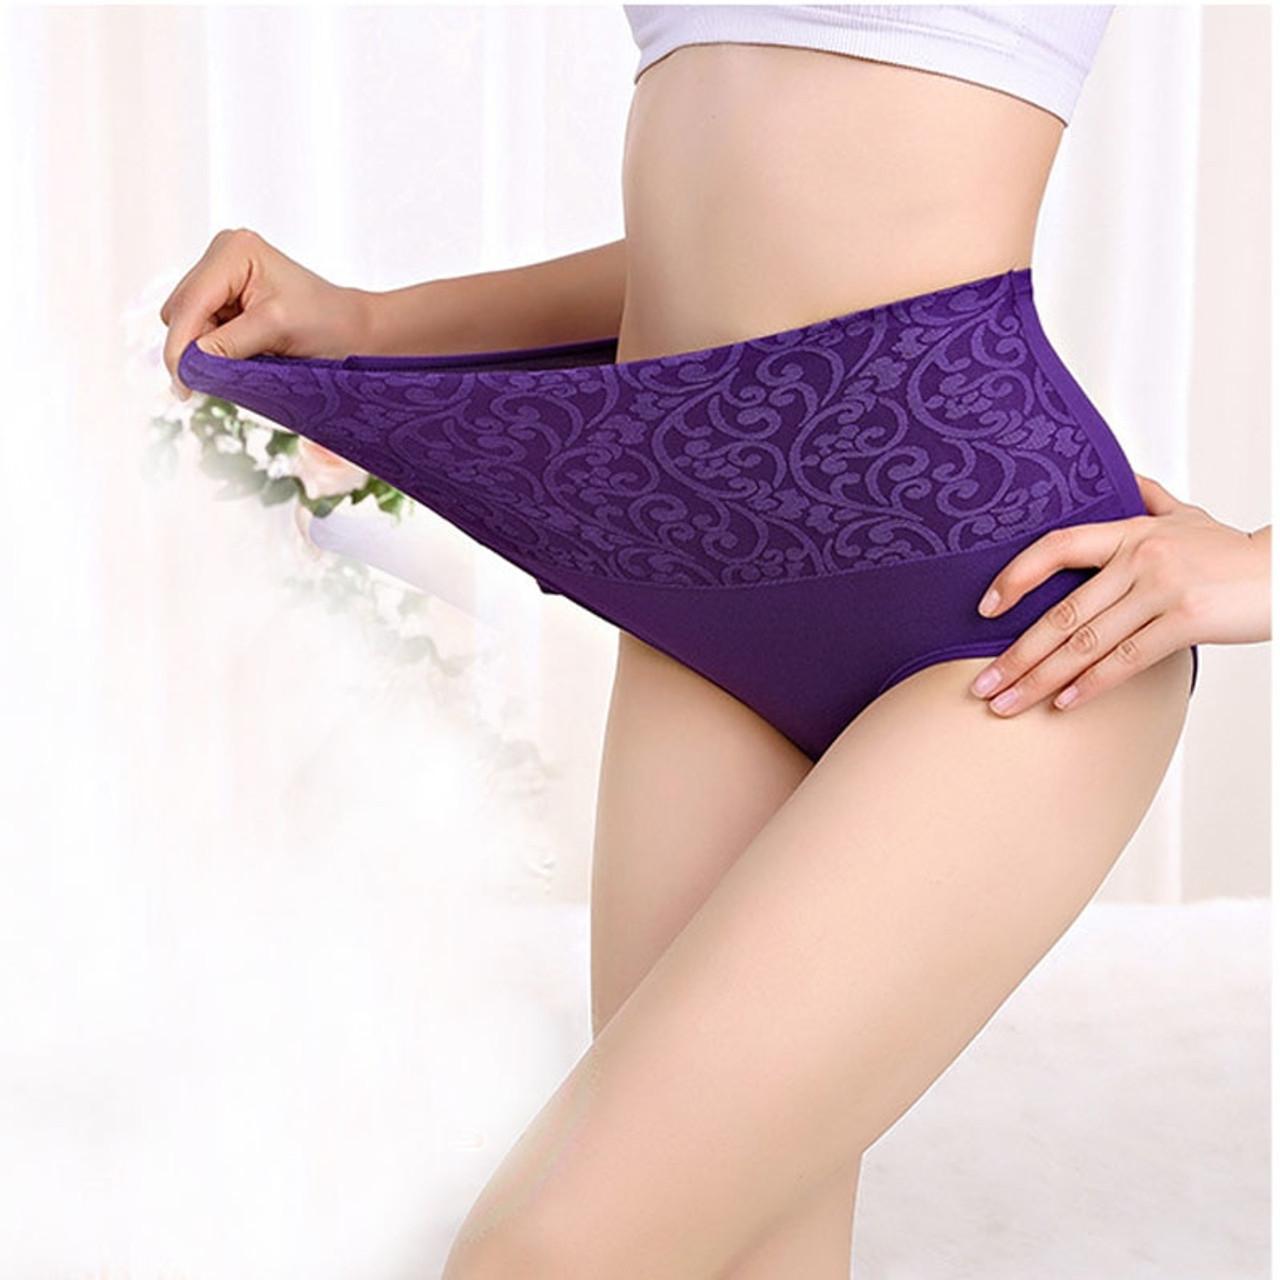 309a6b8aa962 ... Cotton Underwear Women Panties High Waist Briefs Sexy Panties Cueca  Calcinhas Shorts Transparent Underpants Abdominal Panty ...